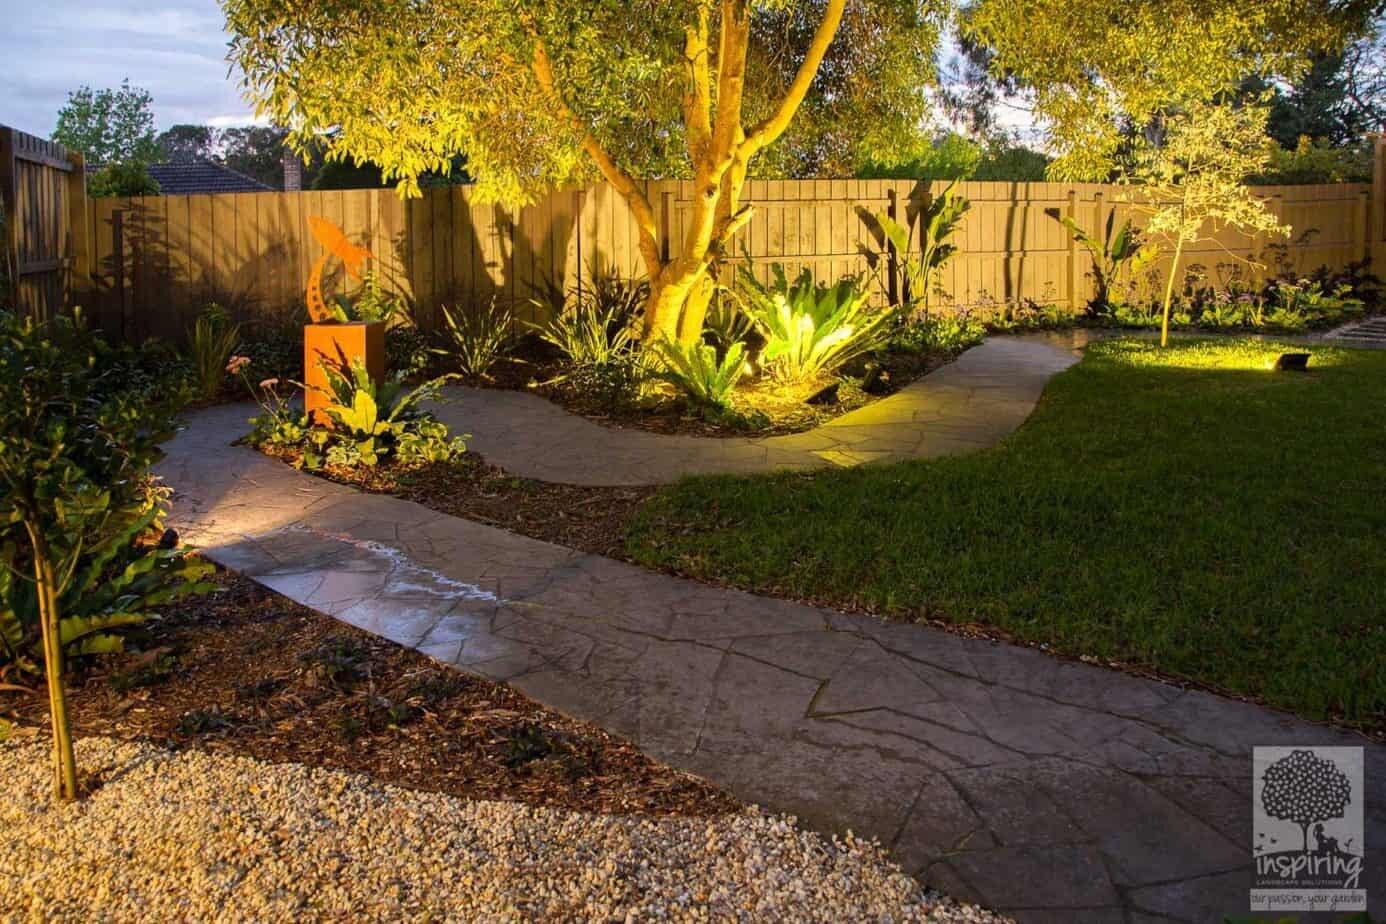 Crazy paved path in Blackburn garden design with rocket metal sculpture